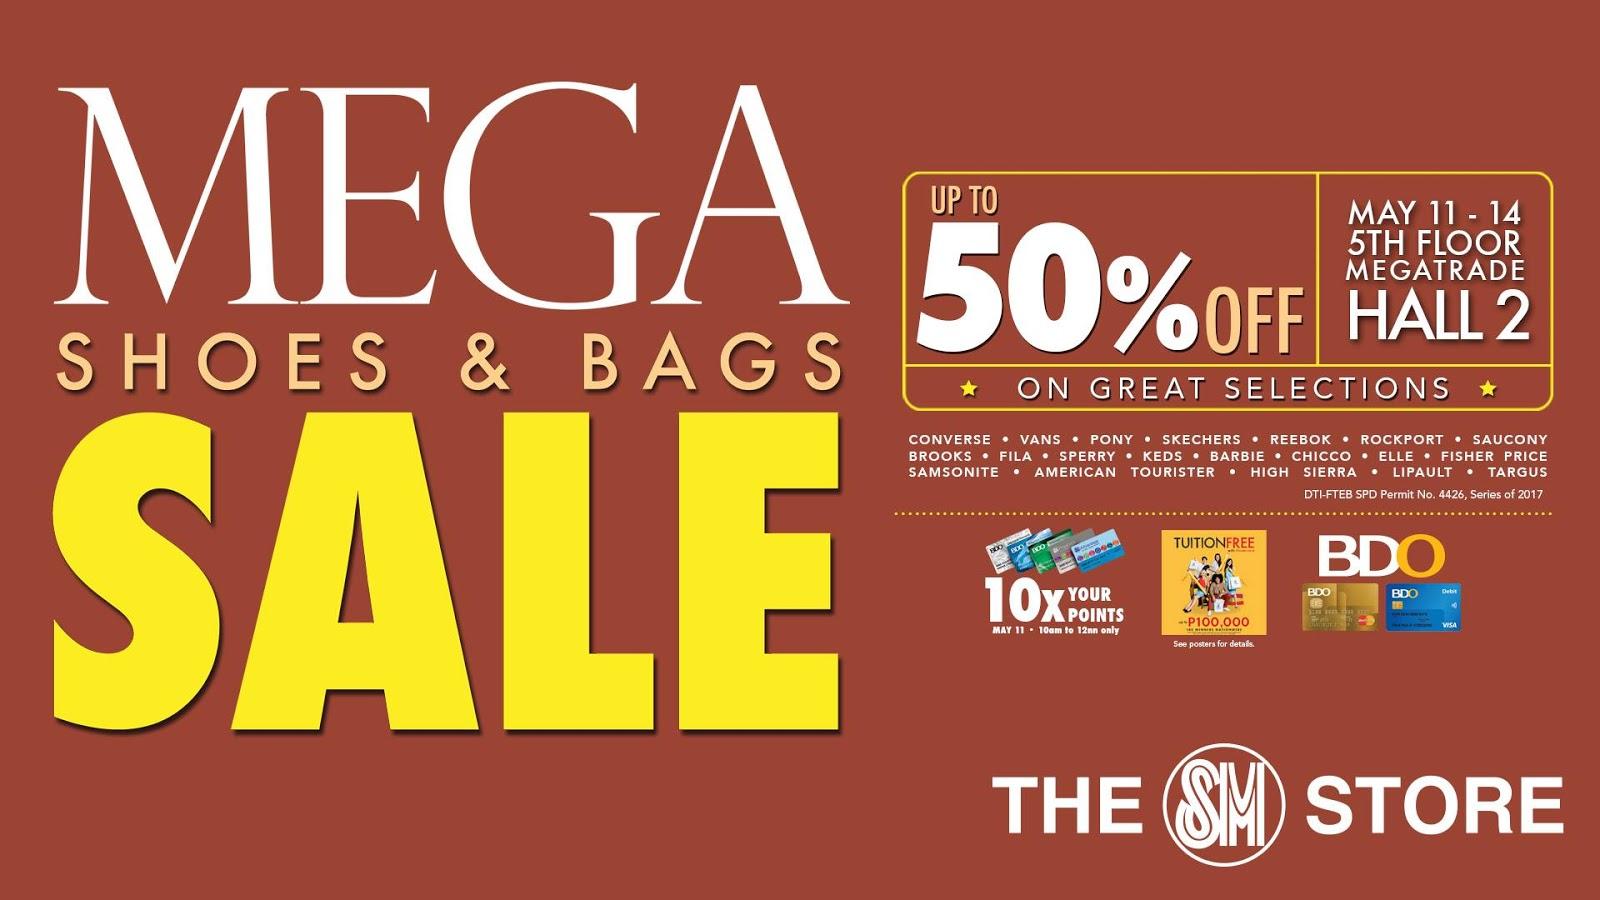 b0214e3f247 Manila Shopper  Mega Shoes   Bags SALE at SM Megatrade  May 2017